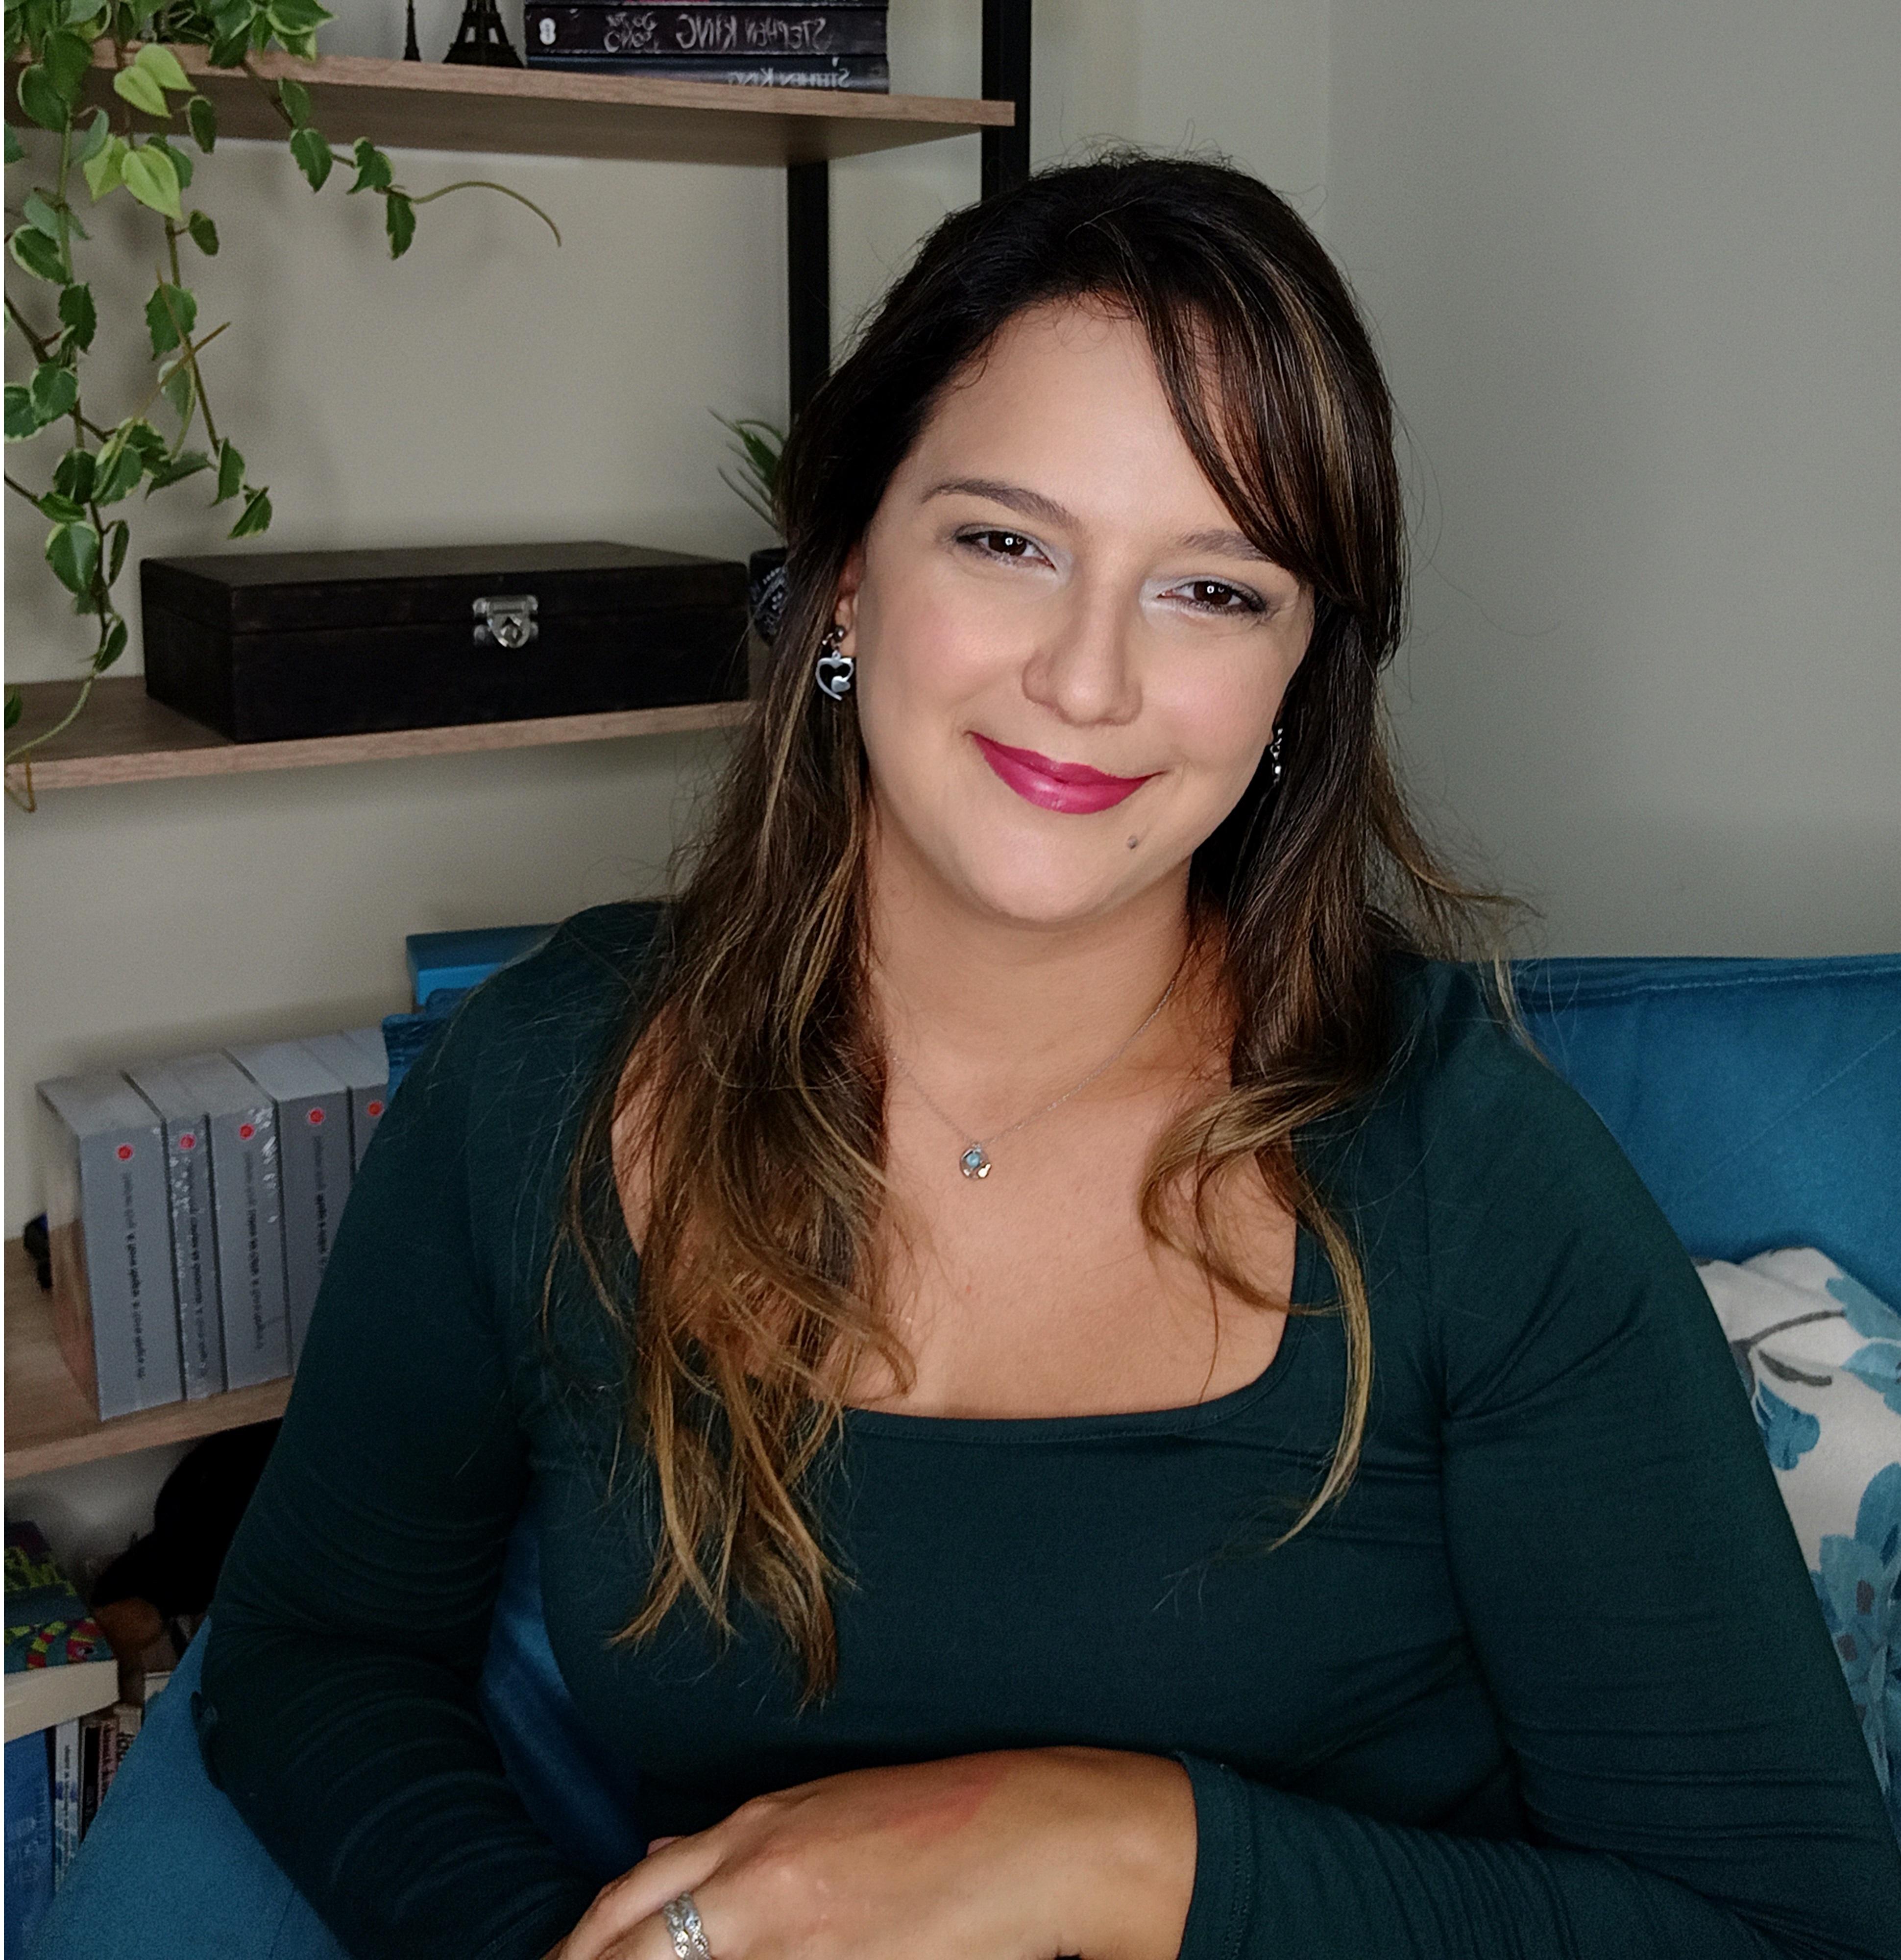 Joana Figueiredo Vartanian